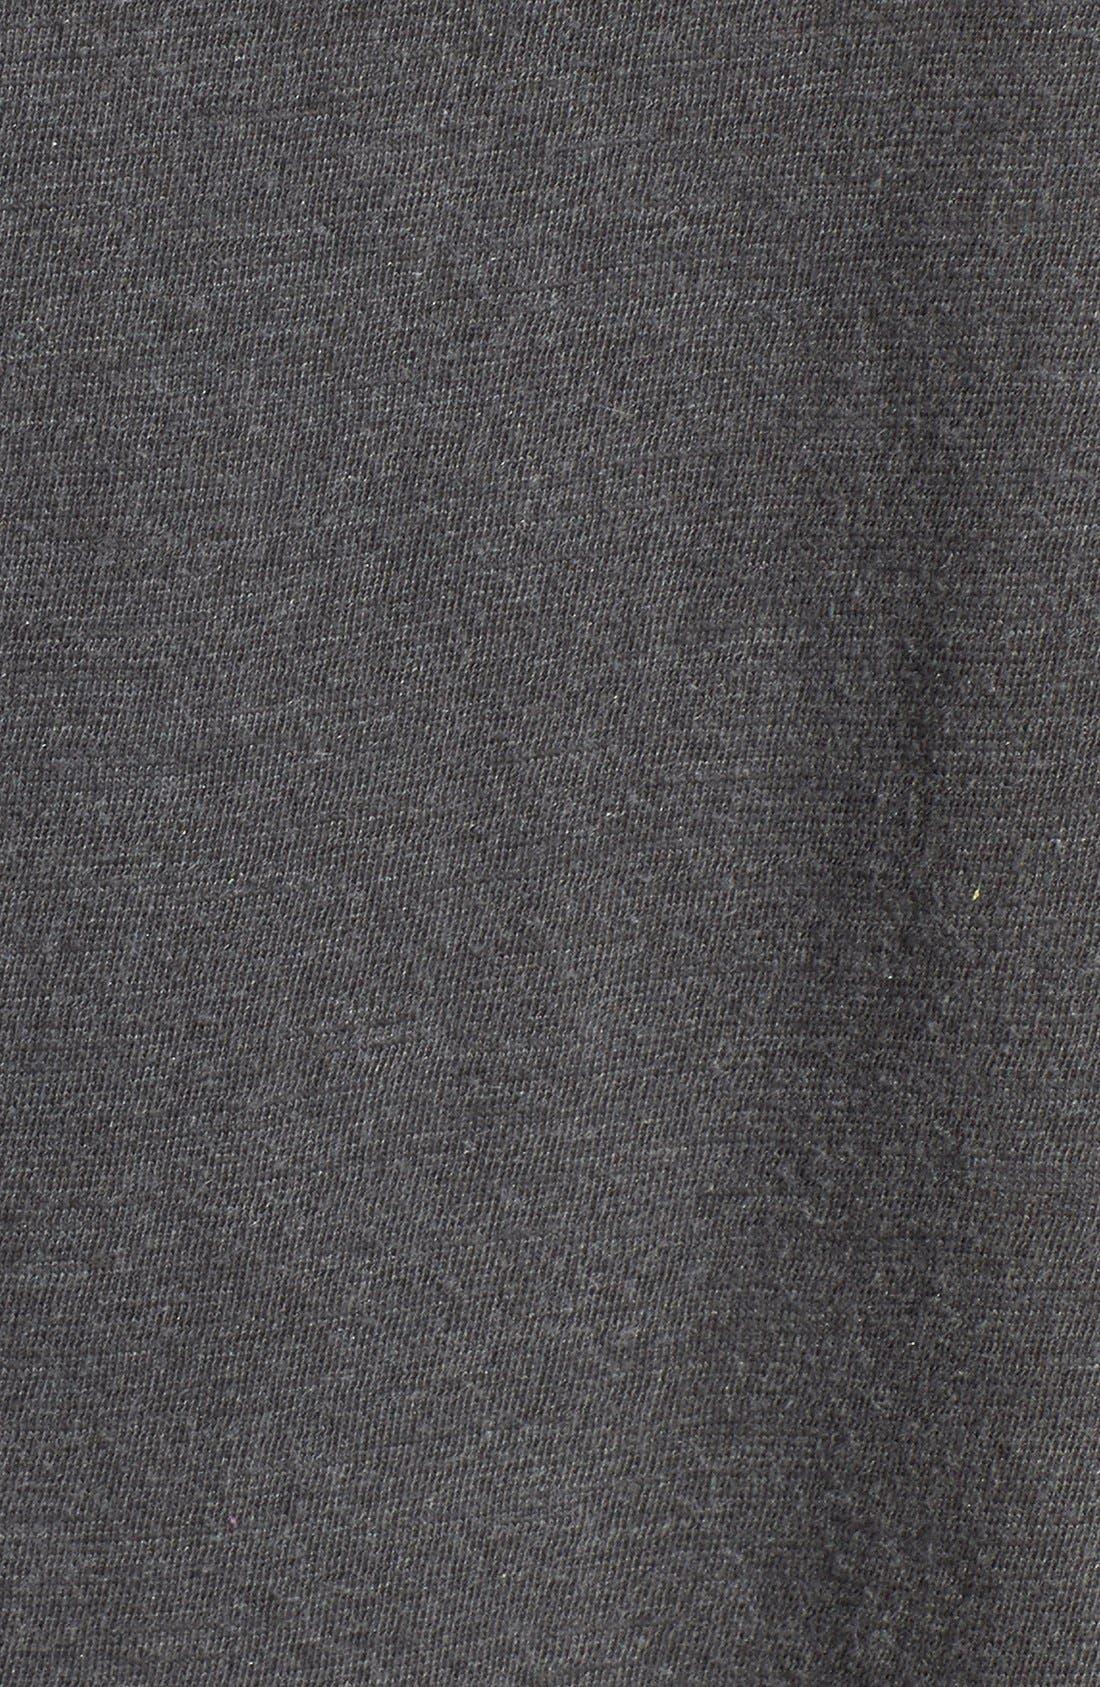 Alternate Image 5  - Billabong 'Forever Salty' Graphic T-Shirt Dress